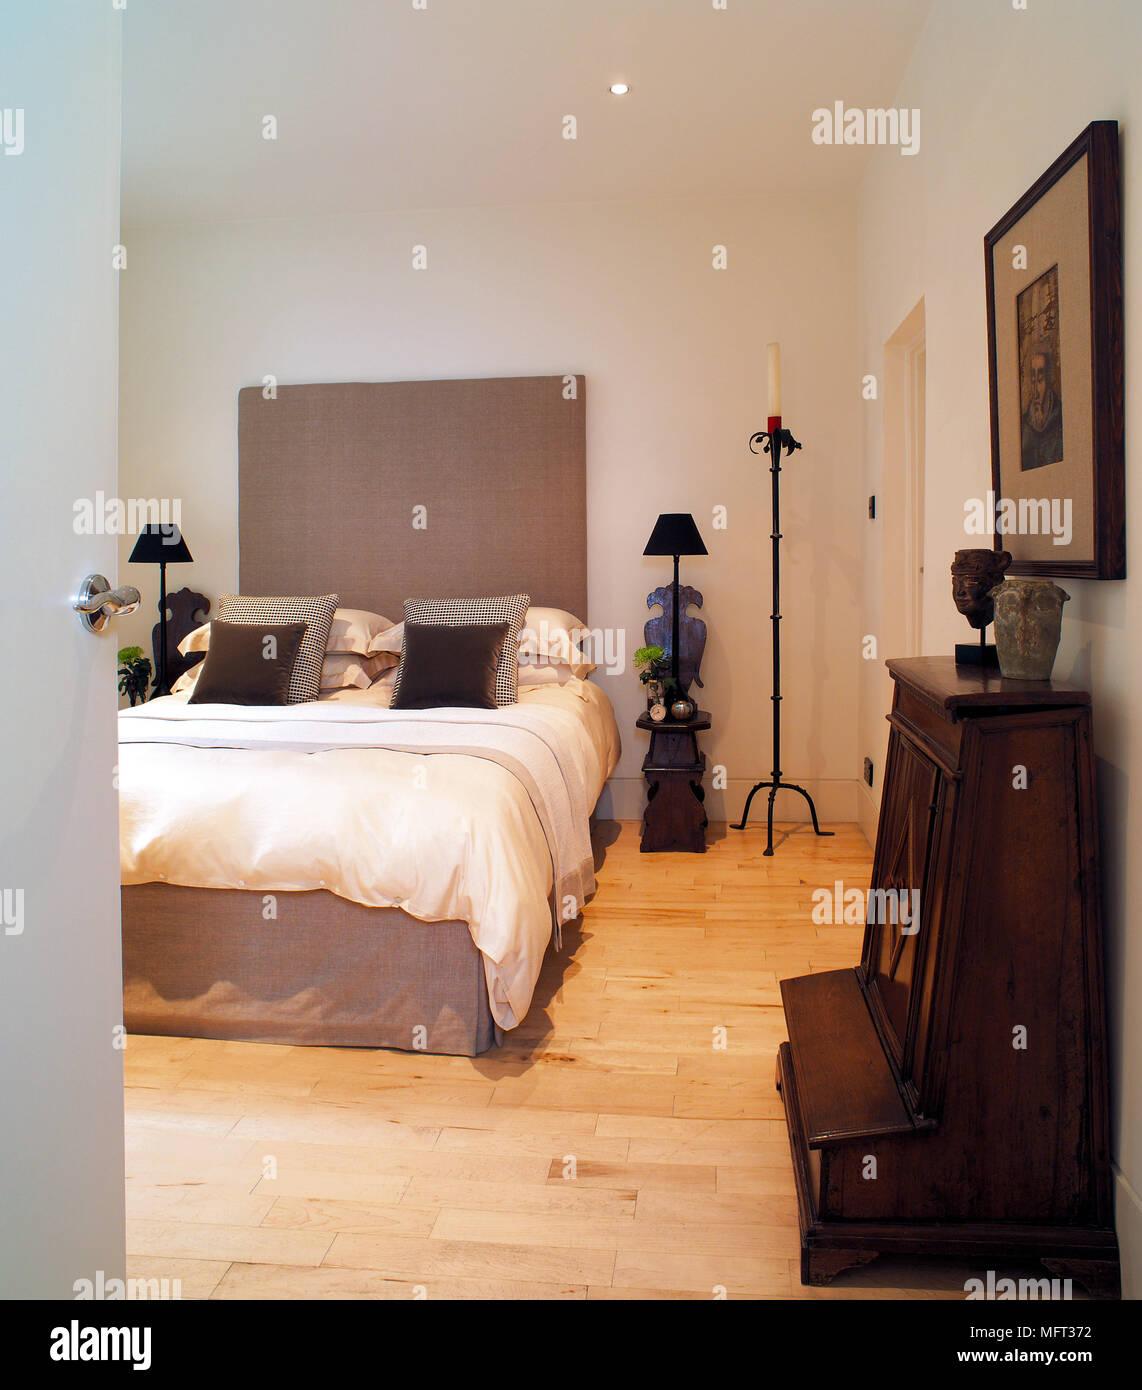 Modernes weißes Schlafzimmer Bett gepolstertes Kopfteil Holzfußboden ...